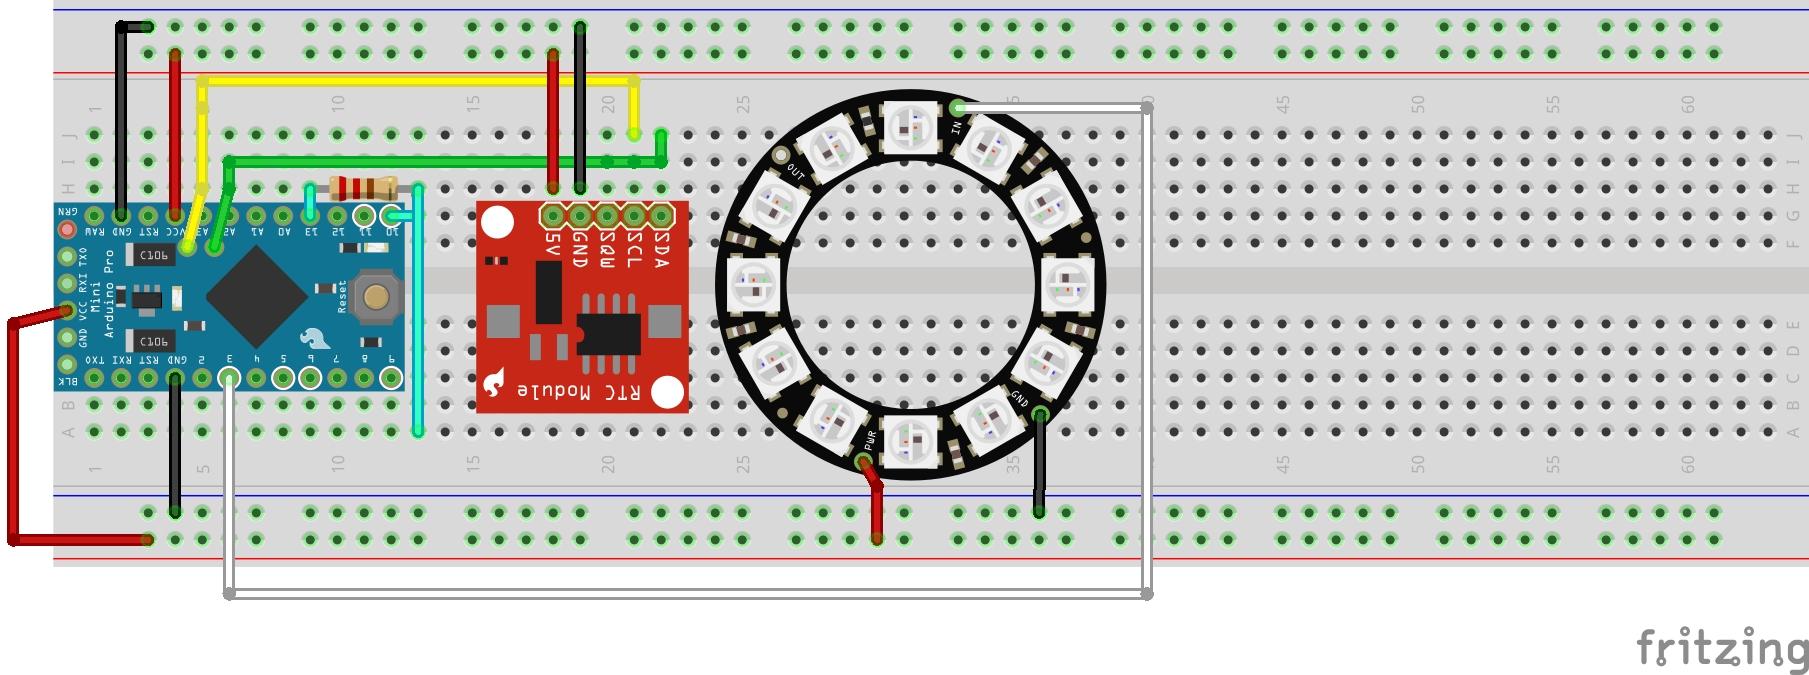 TinyCircuits - Maker of Tiny, Open Source Electronics